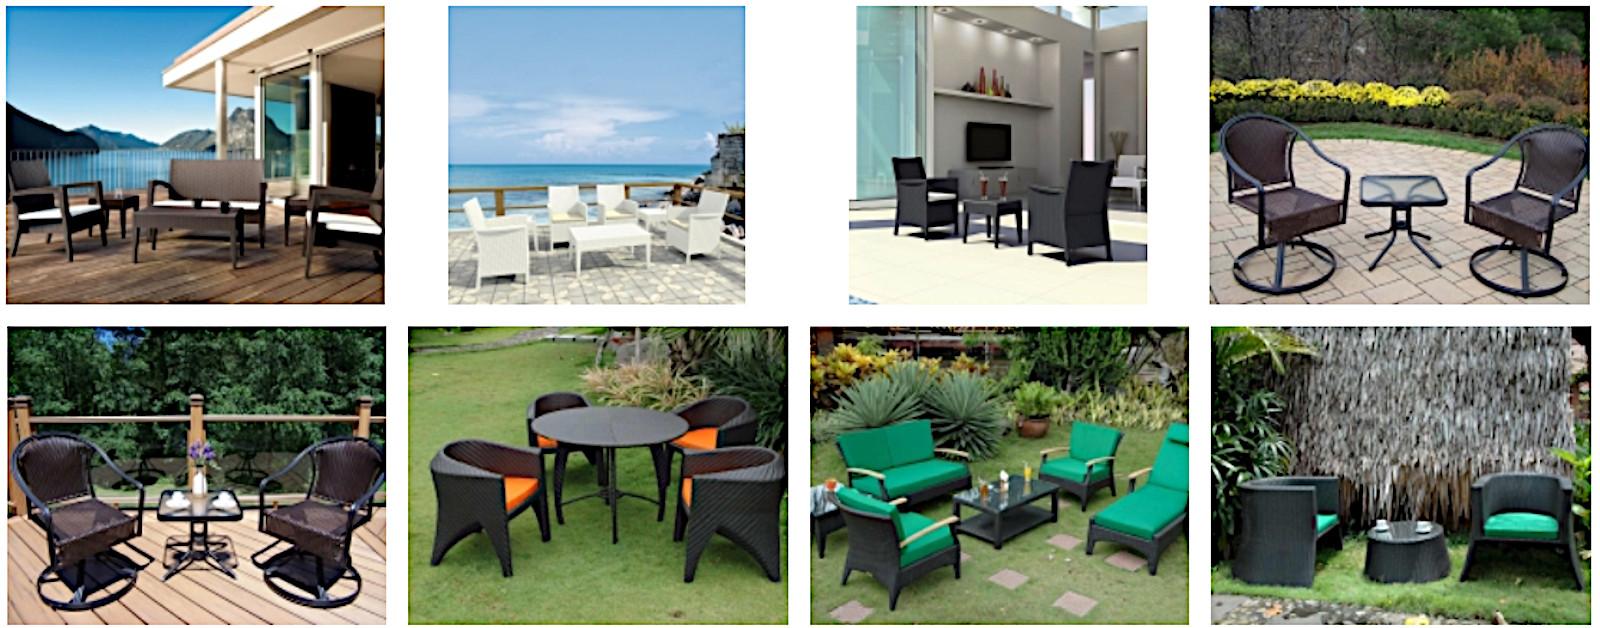 Enhanced adirondack patio furniture